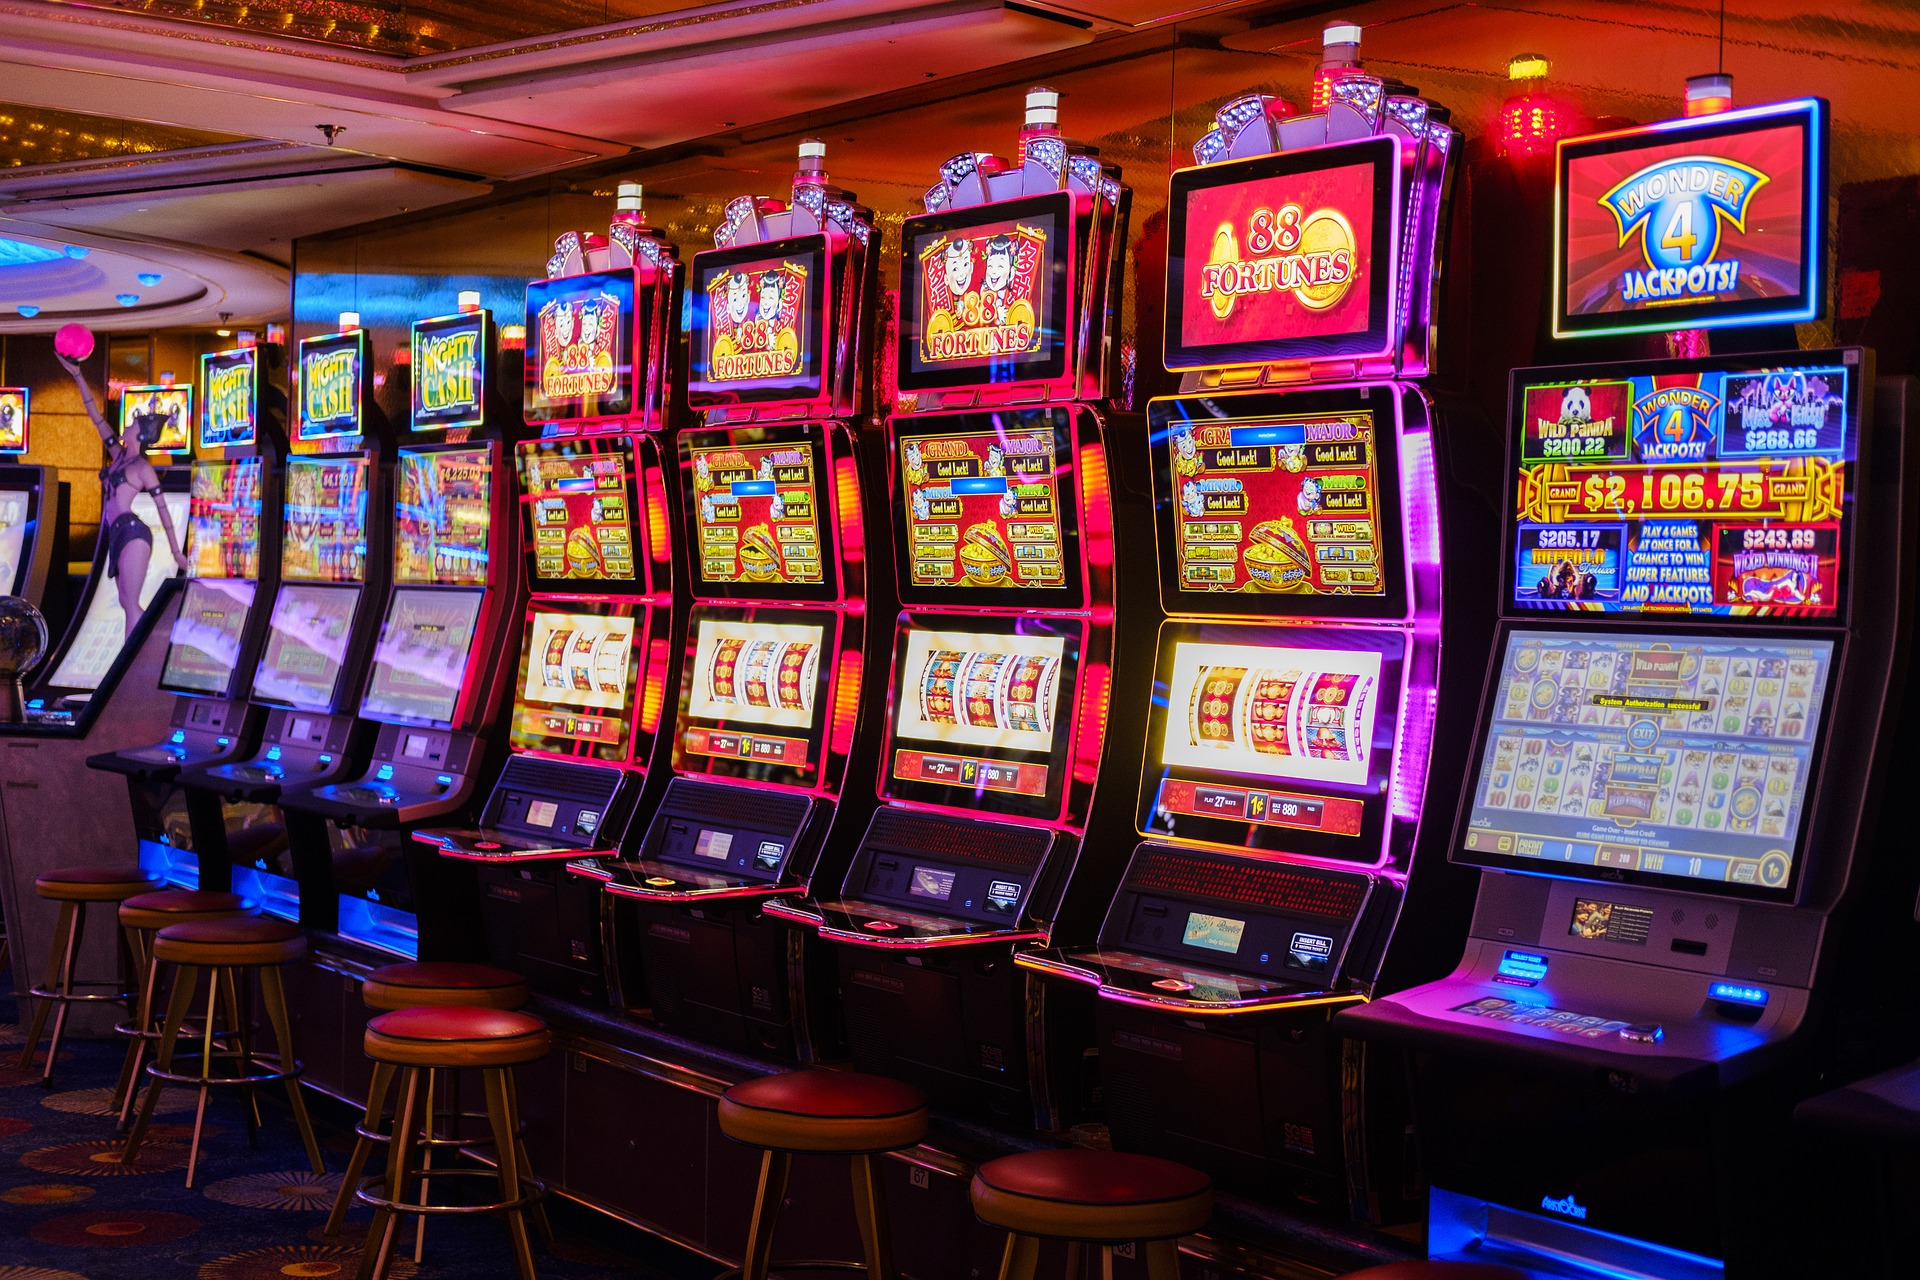 slot machines activity in Romania